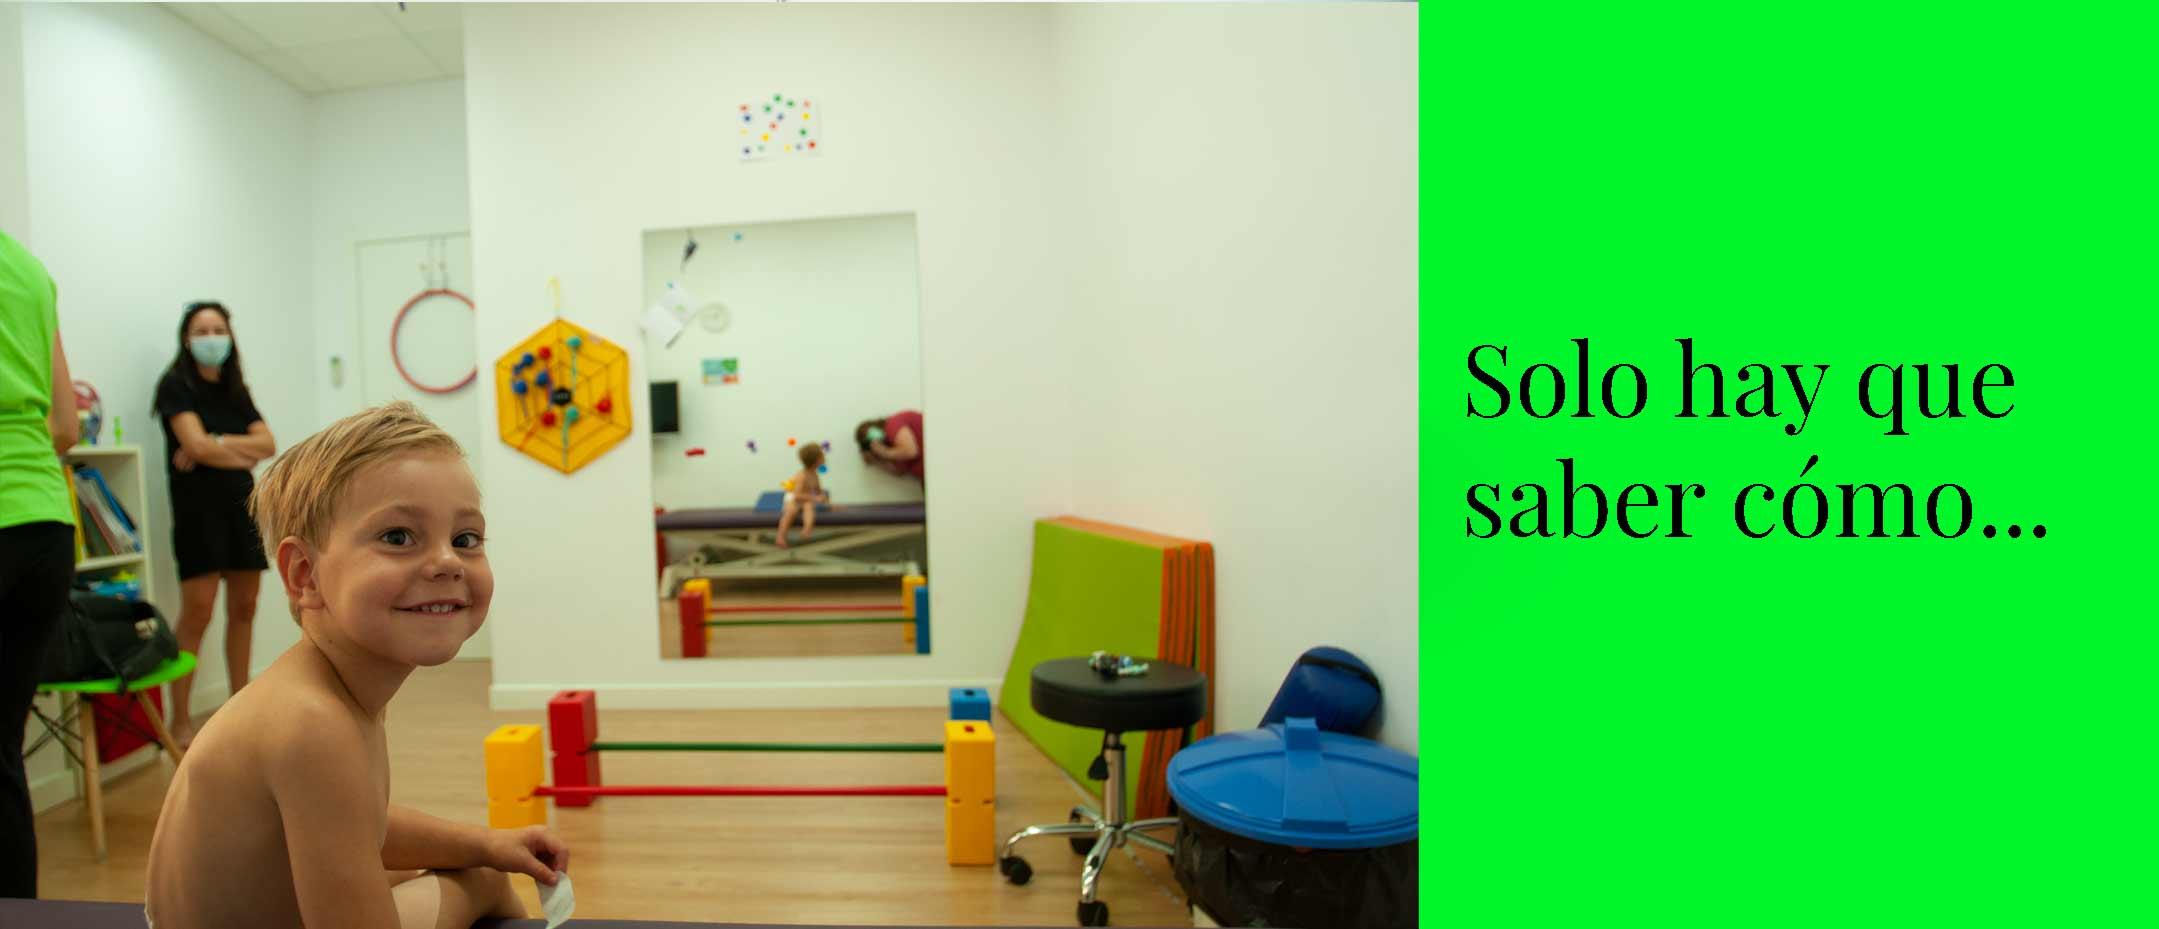 centro-de-fisioterapia-gaia-banner-2